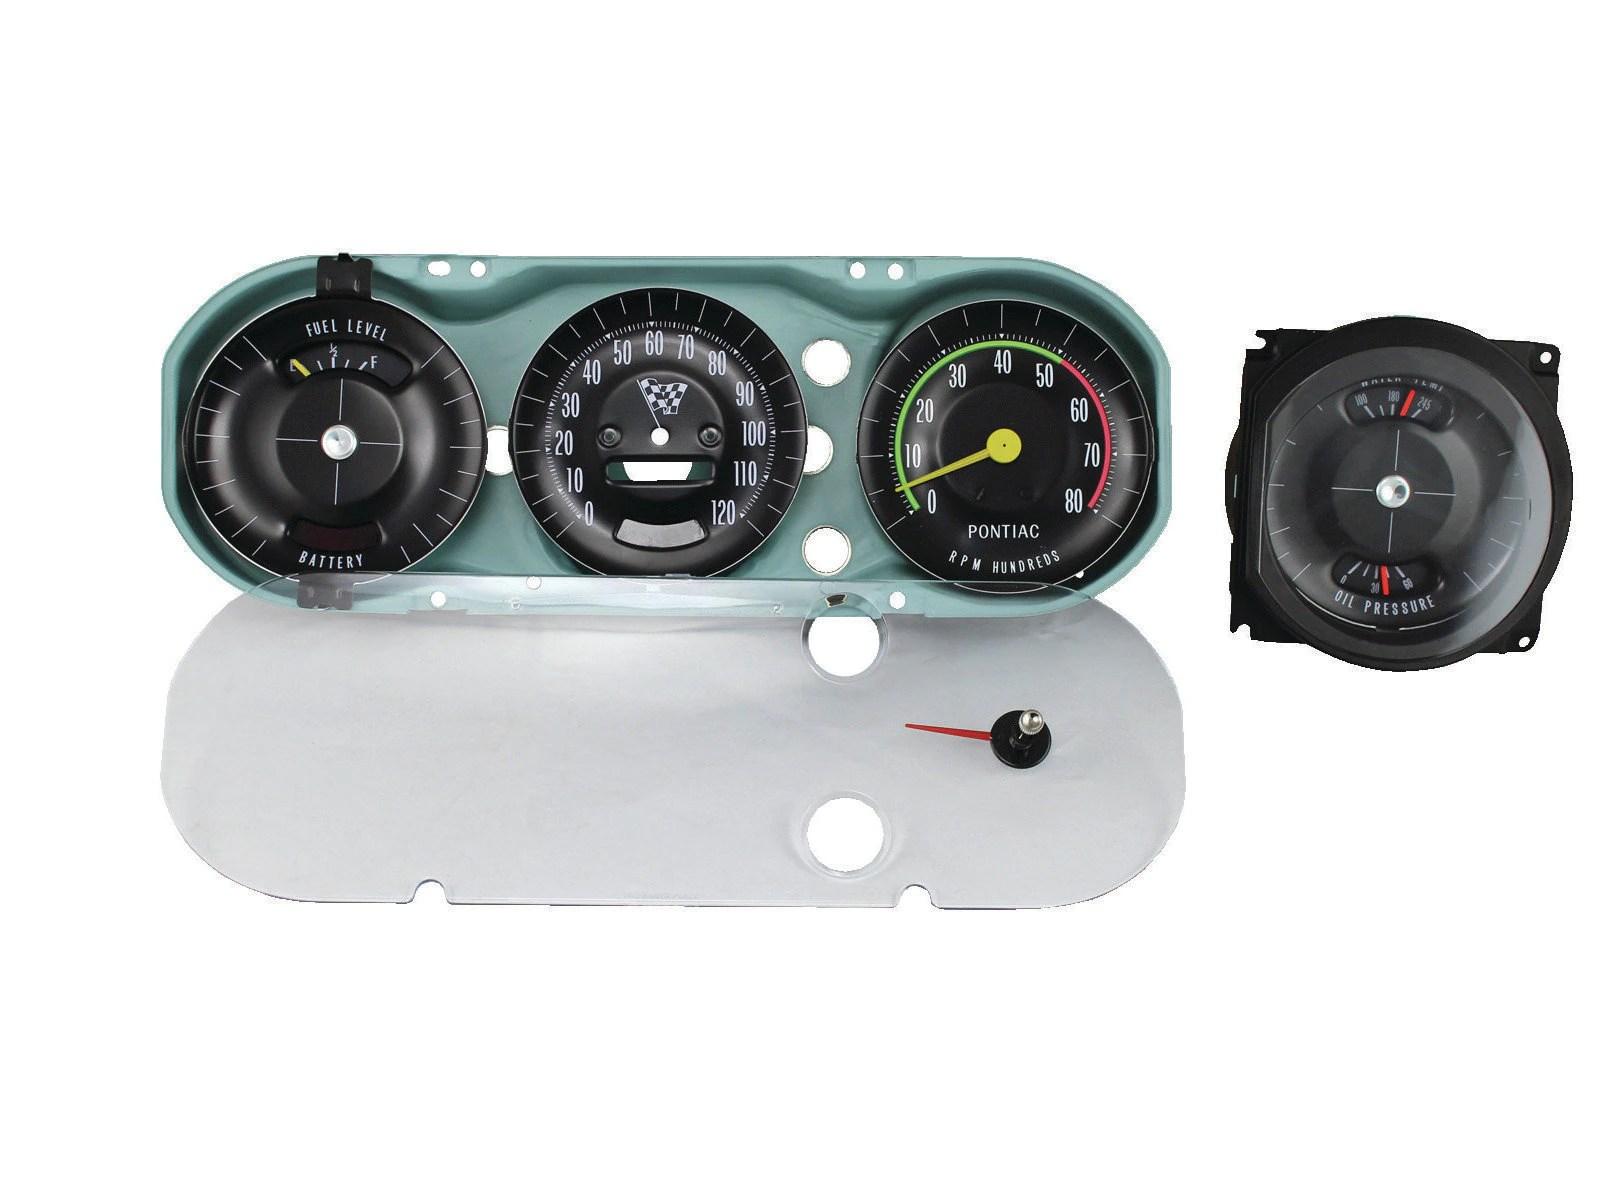 hight resolution of 1967 gto rally gauge wiring diagram wiring 1964 pontiac gto wiring diagram 67 gto rally